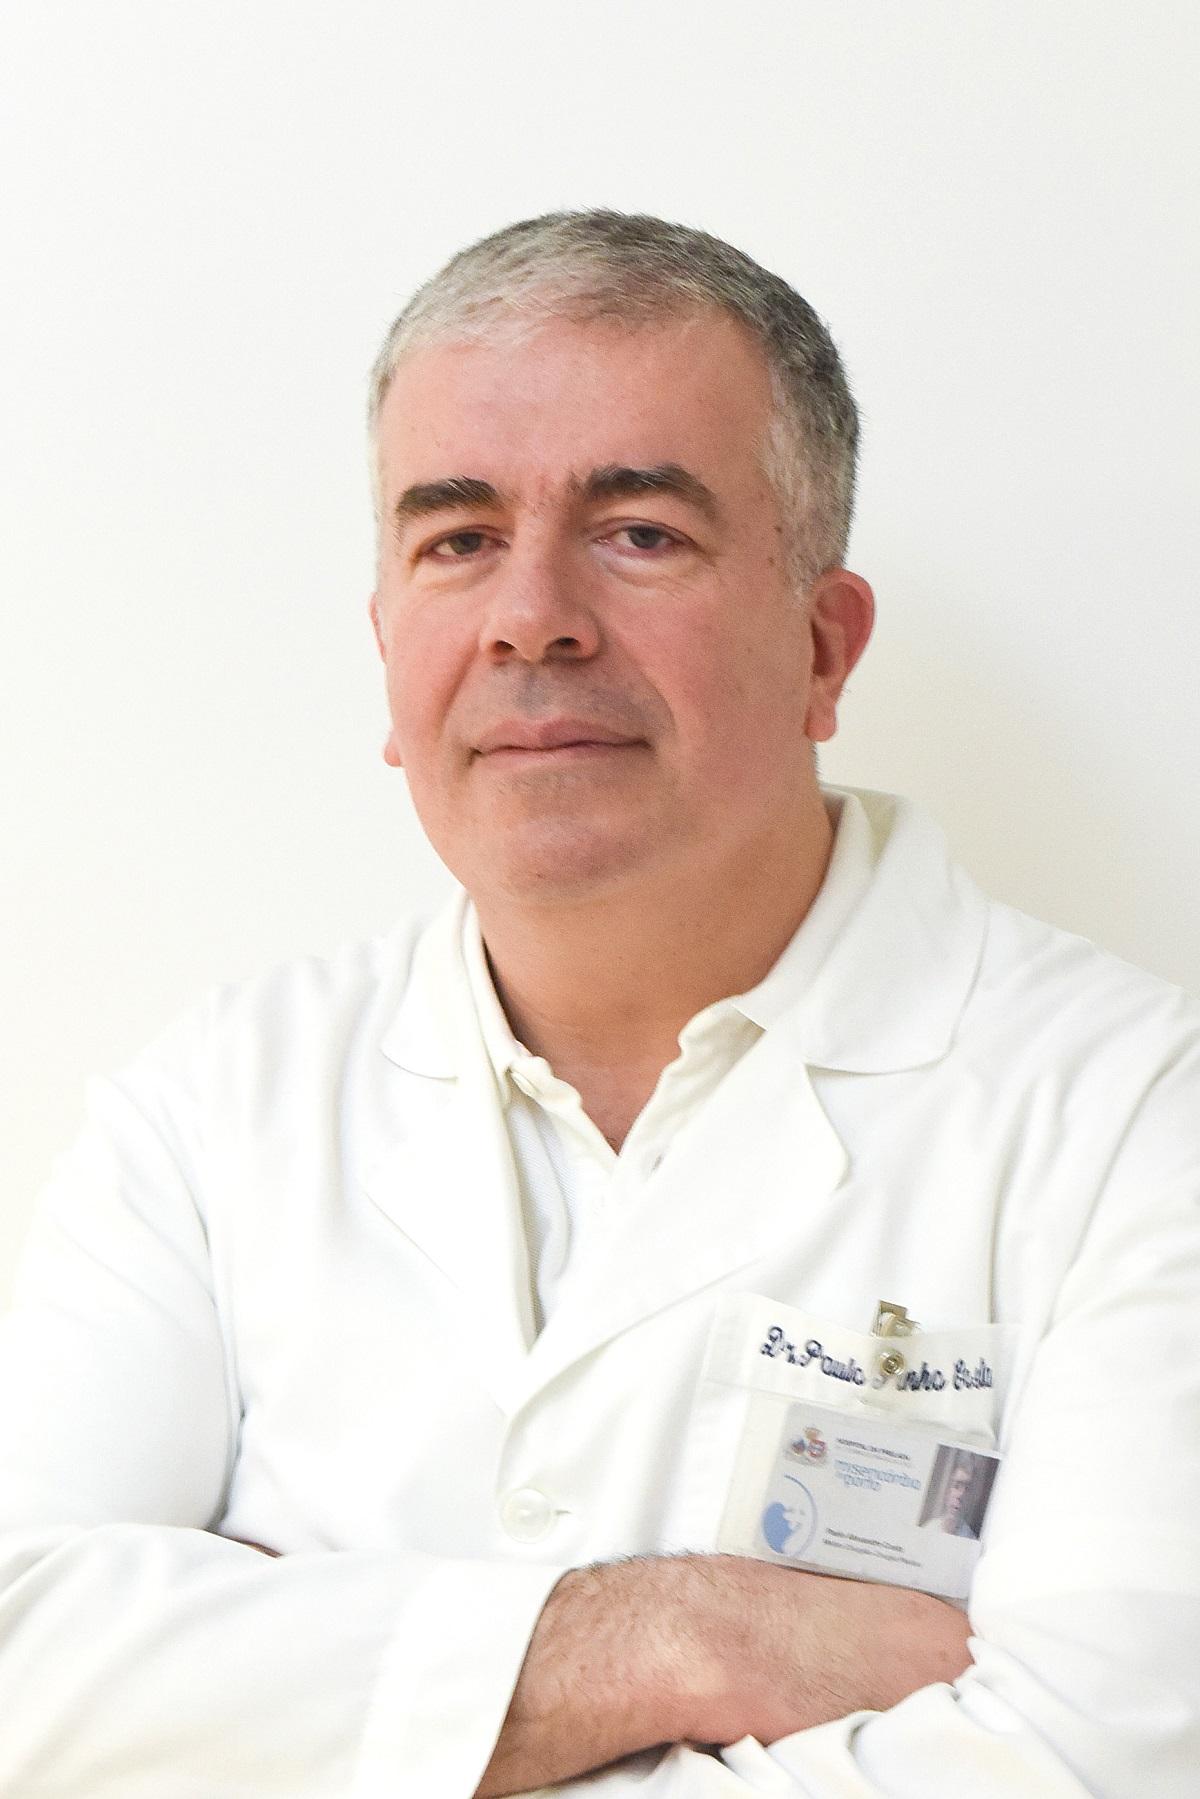 Paulo Costa - Corpo Clínico - Portal da Saúde da Misericórdia do Porto